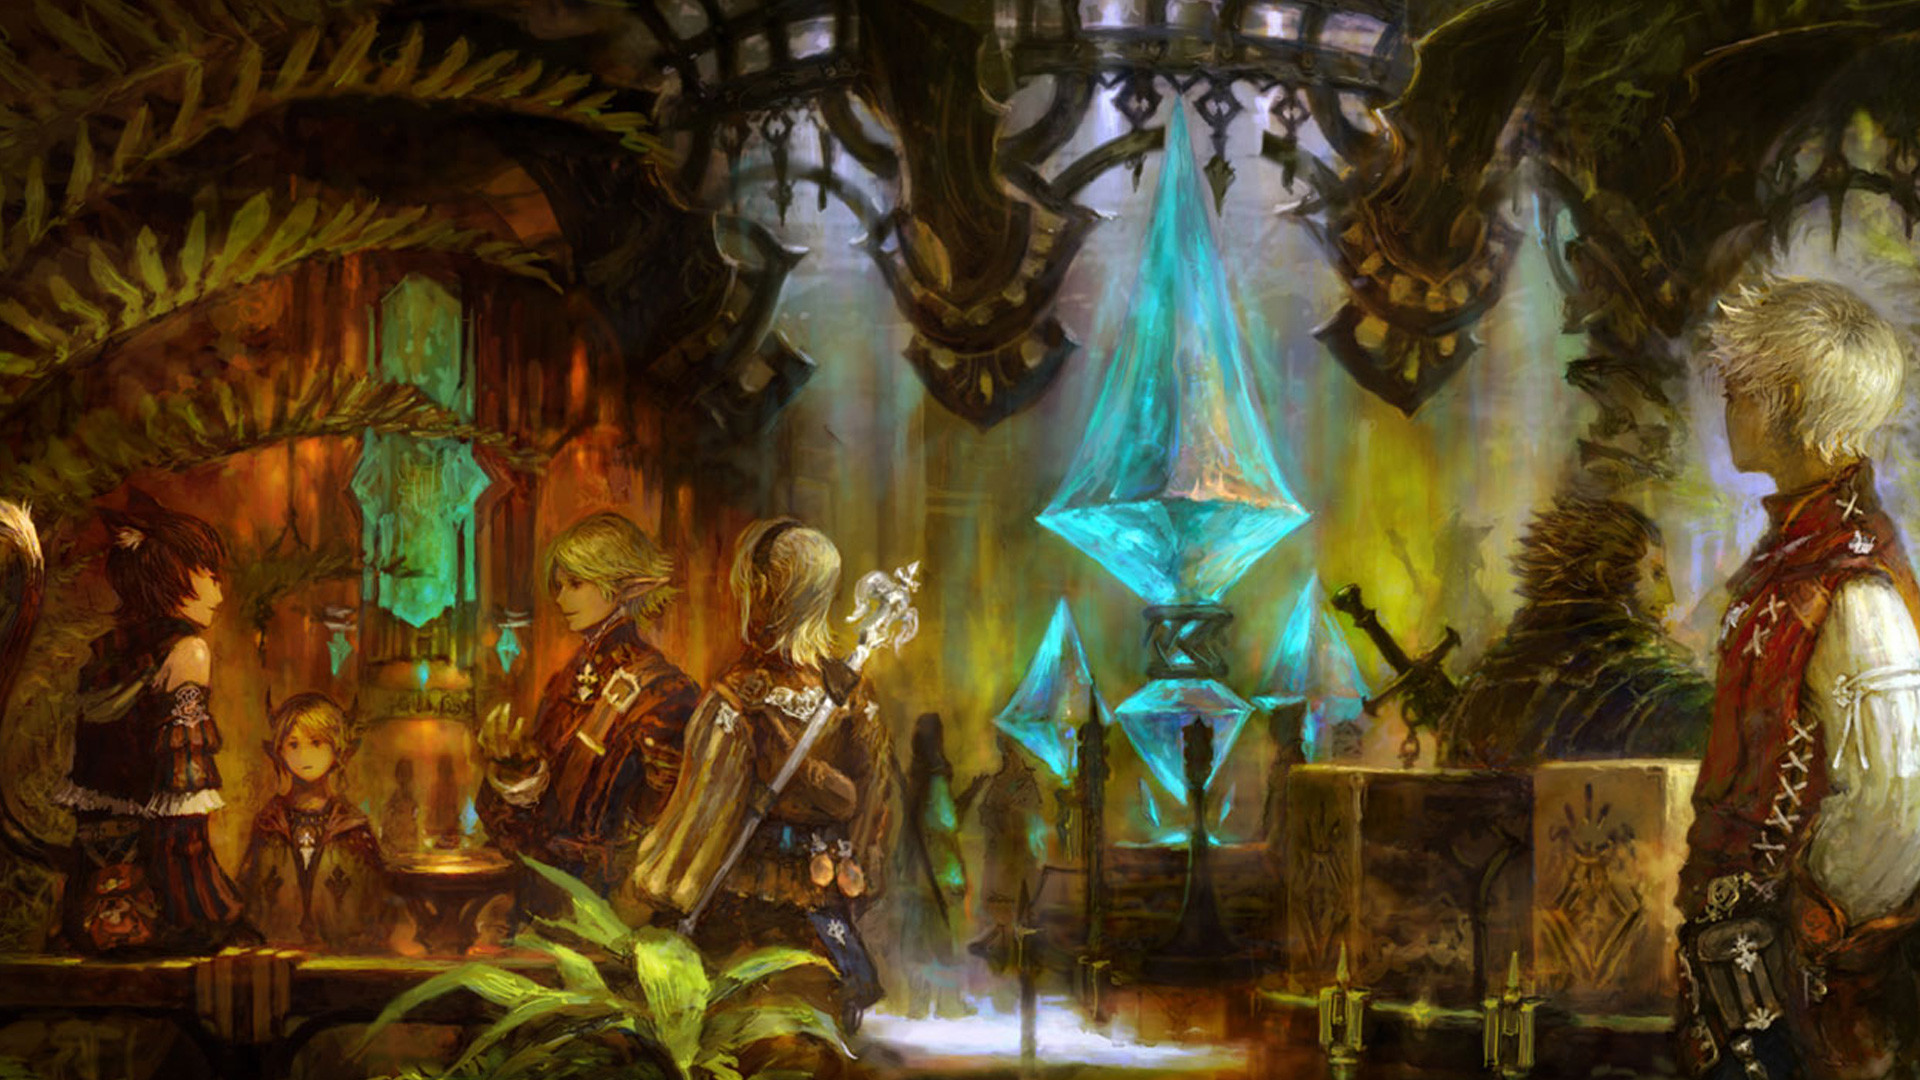 fantasy art | Final fantasy art concept wallpapers wallpaper Fantasy HD  Wallpaper .